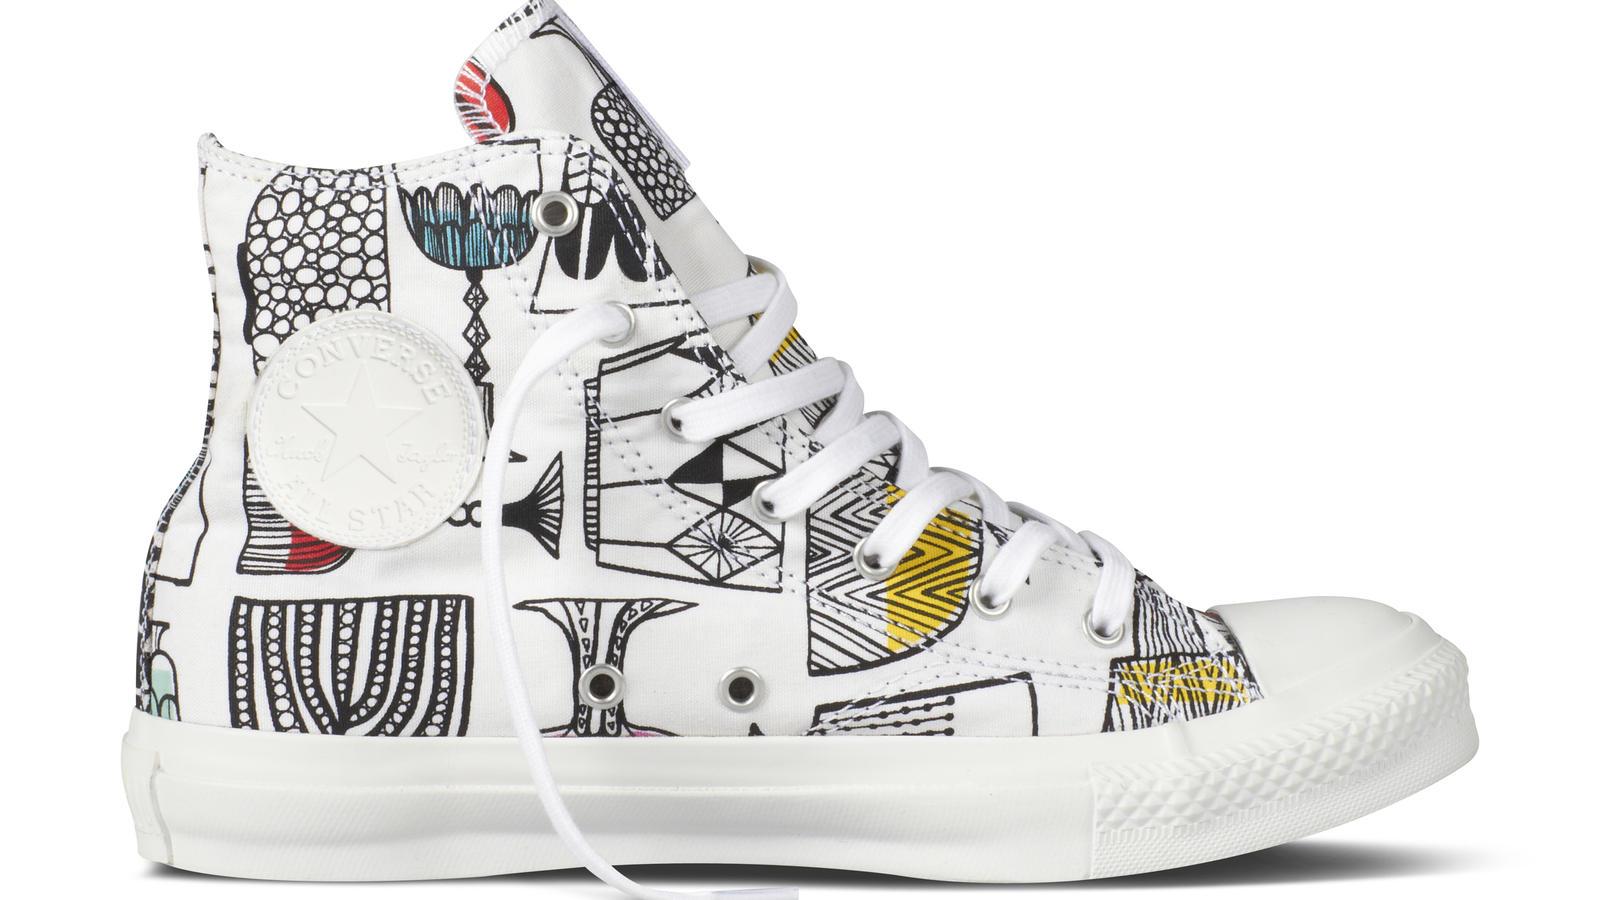 358c0fa20051 Converse Presents Its Fall 2012 Premium Collection - Nike News